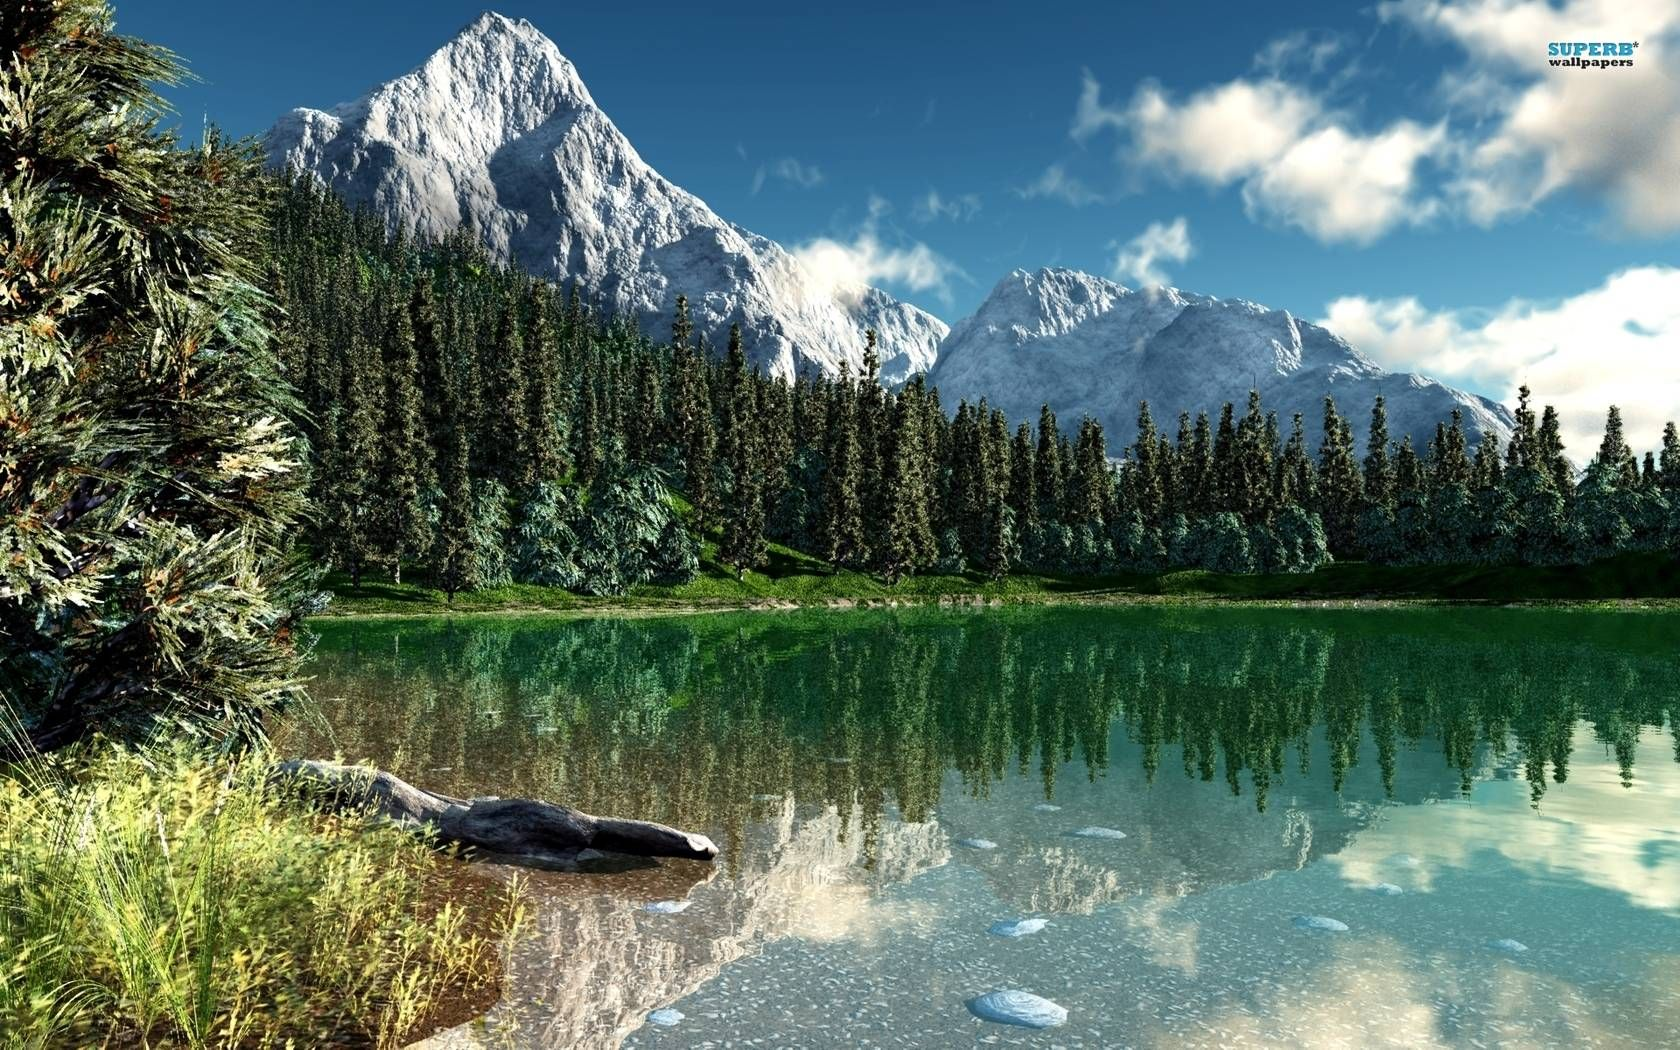 Download dreamy mountains hd wallpaper for 1440 x 900 hdwallpapers - Rocky Mountain National Park Wallpapers Wallpaper